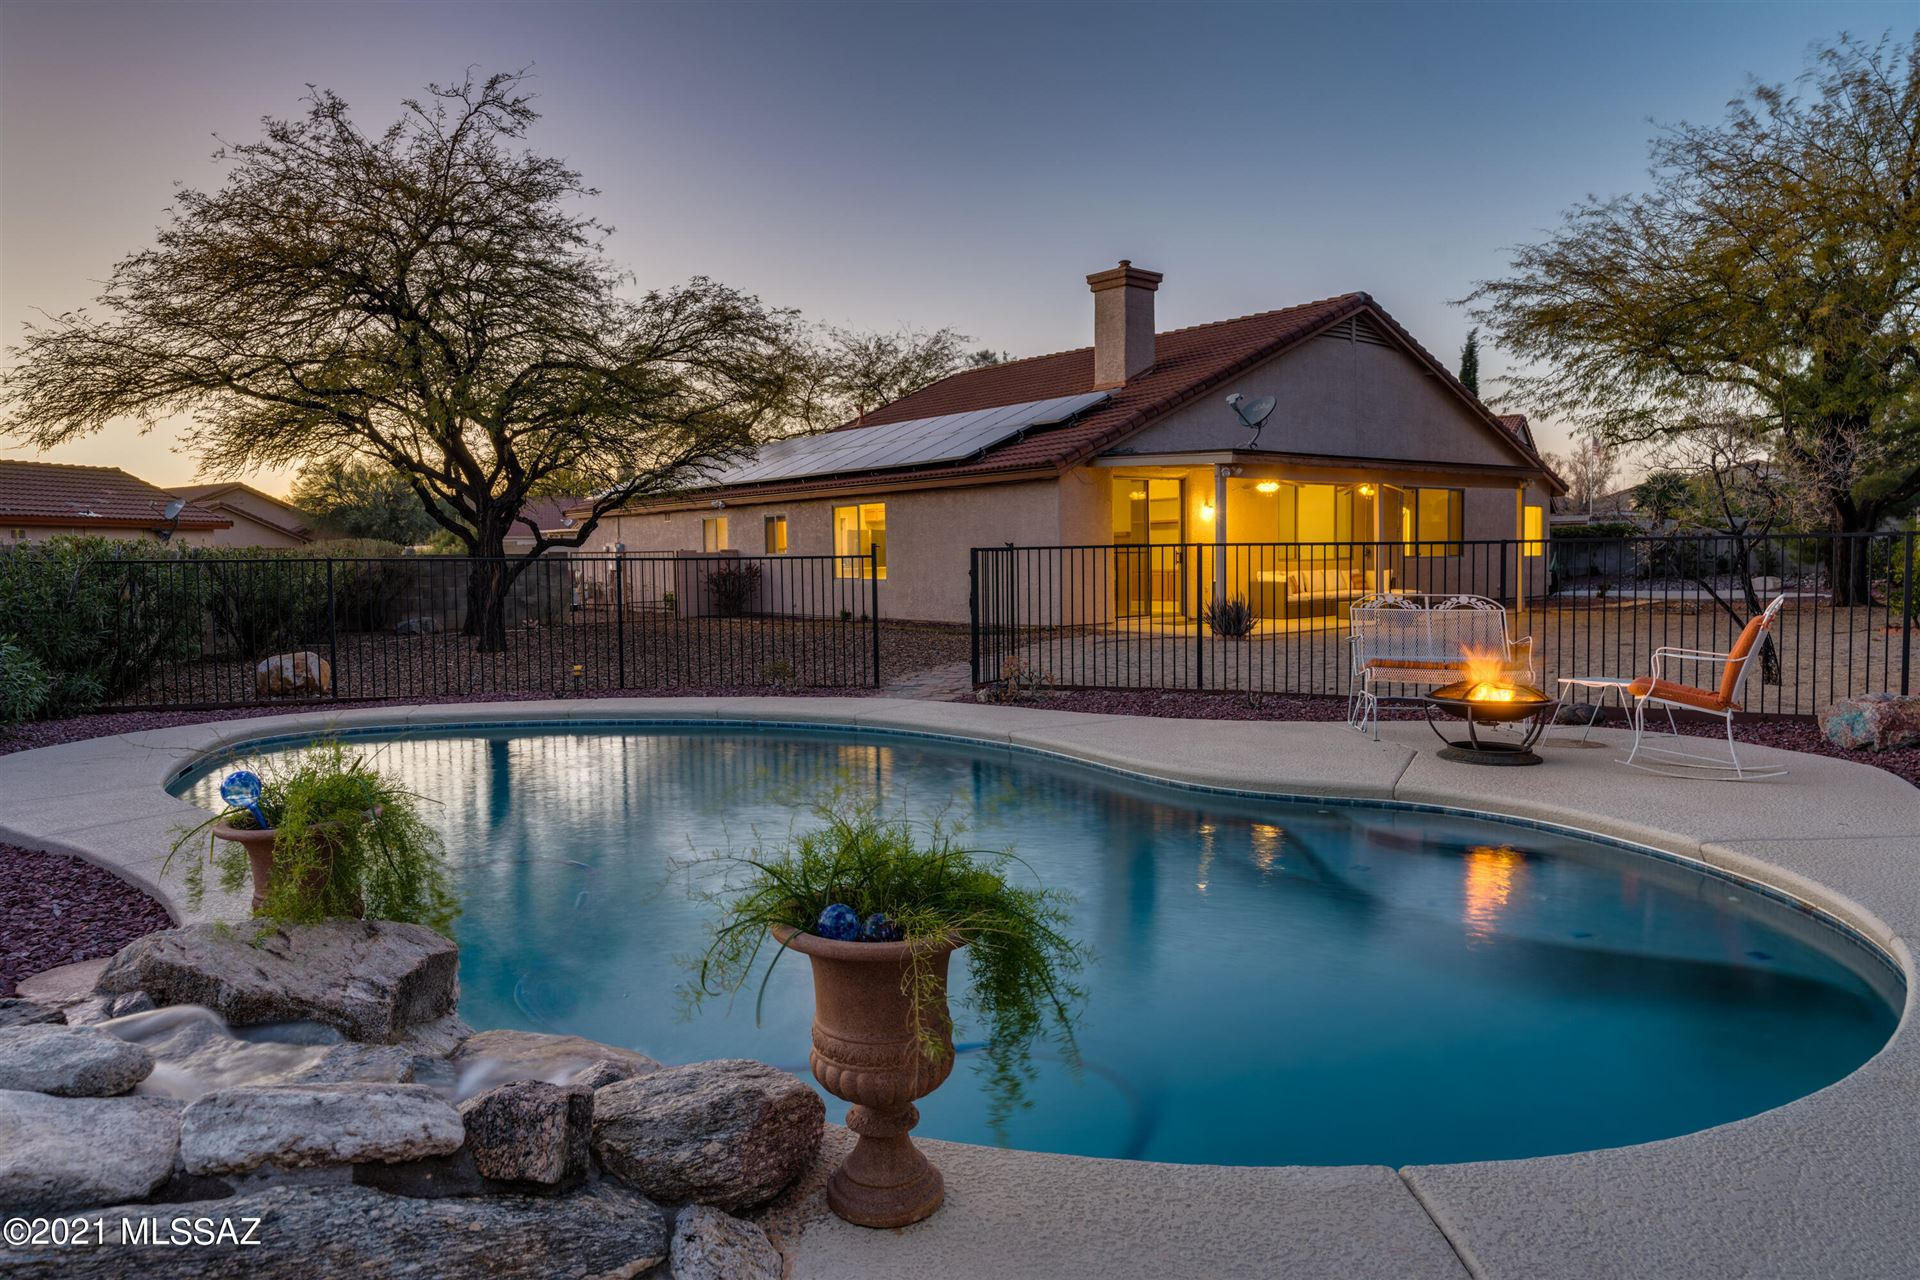 7549 S Daystar Court, Tucson, AZ 85747 - MLS#: 22105208